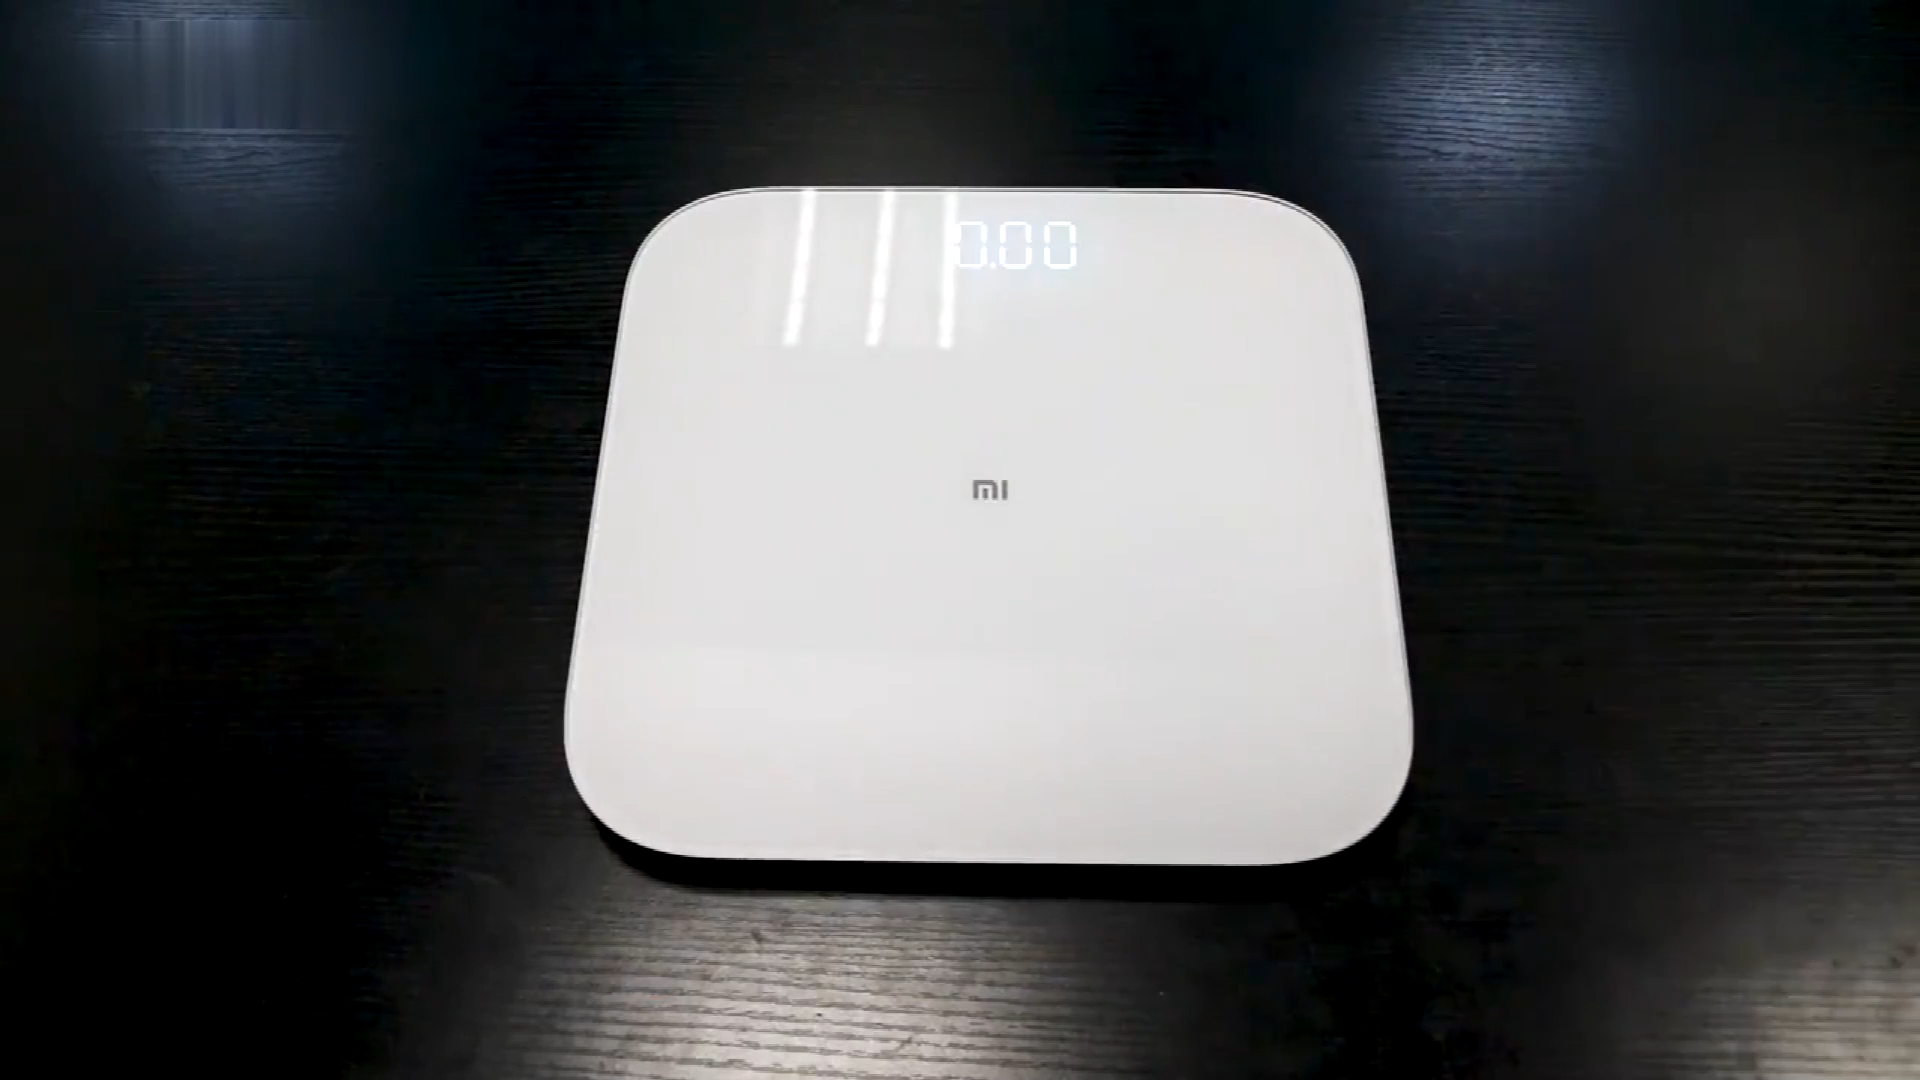 Xiaomi Berat Skala Kamar Mandi Elektronik Skala Keseimbangan Dukungan APP Bluetooth Hot Sale Serta Berat Timbangan Pintar